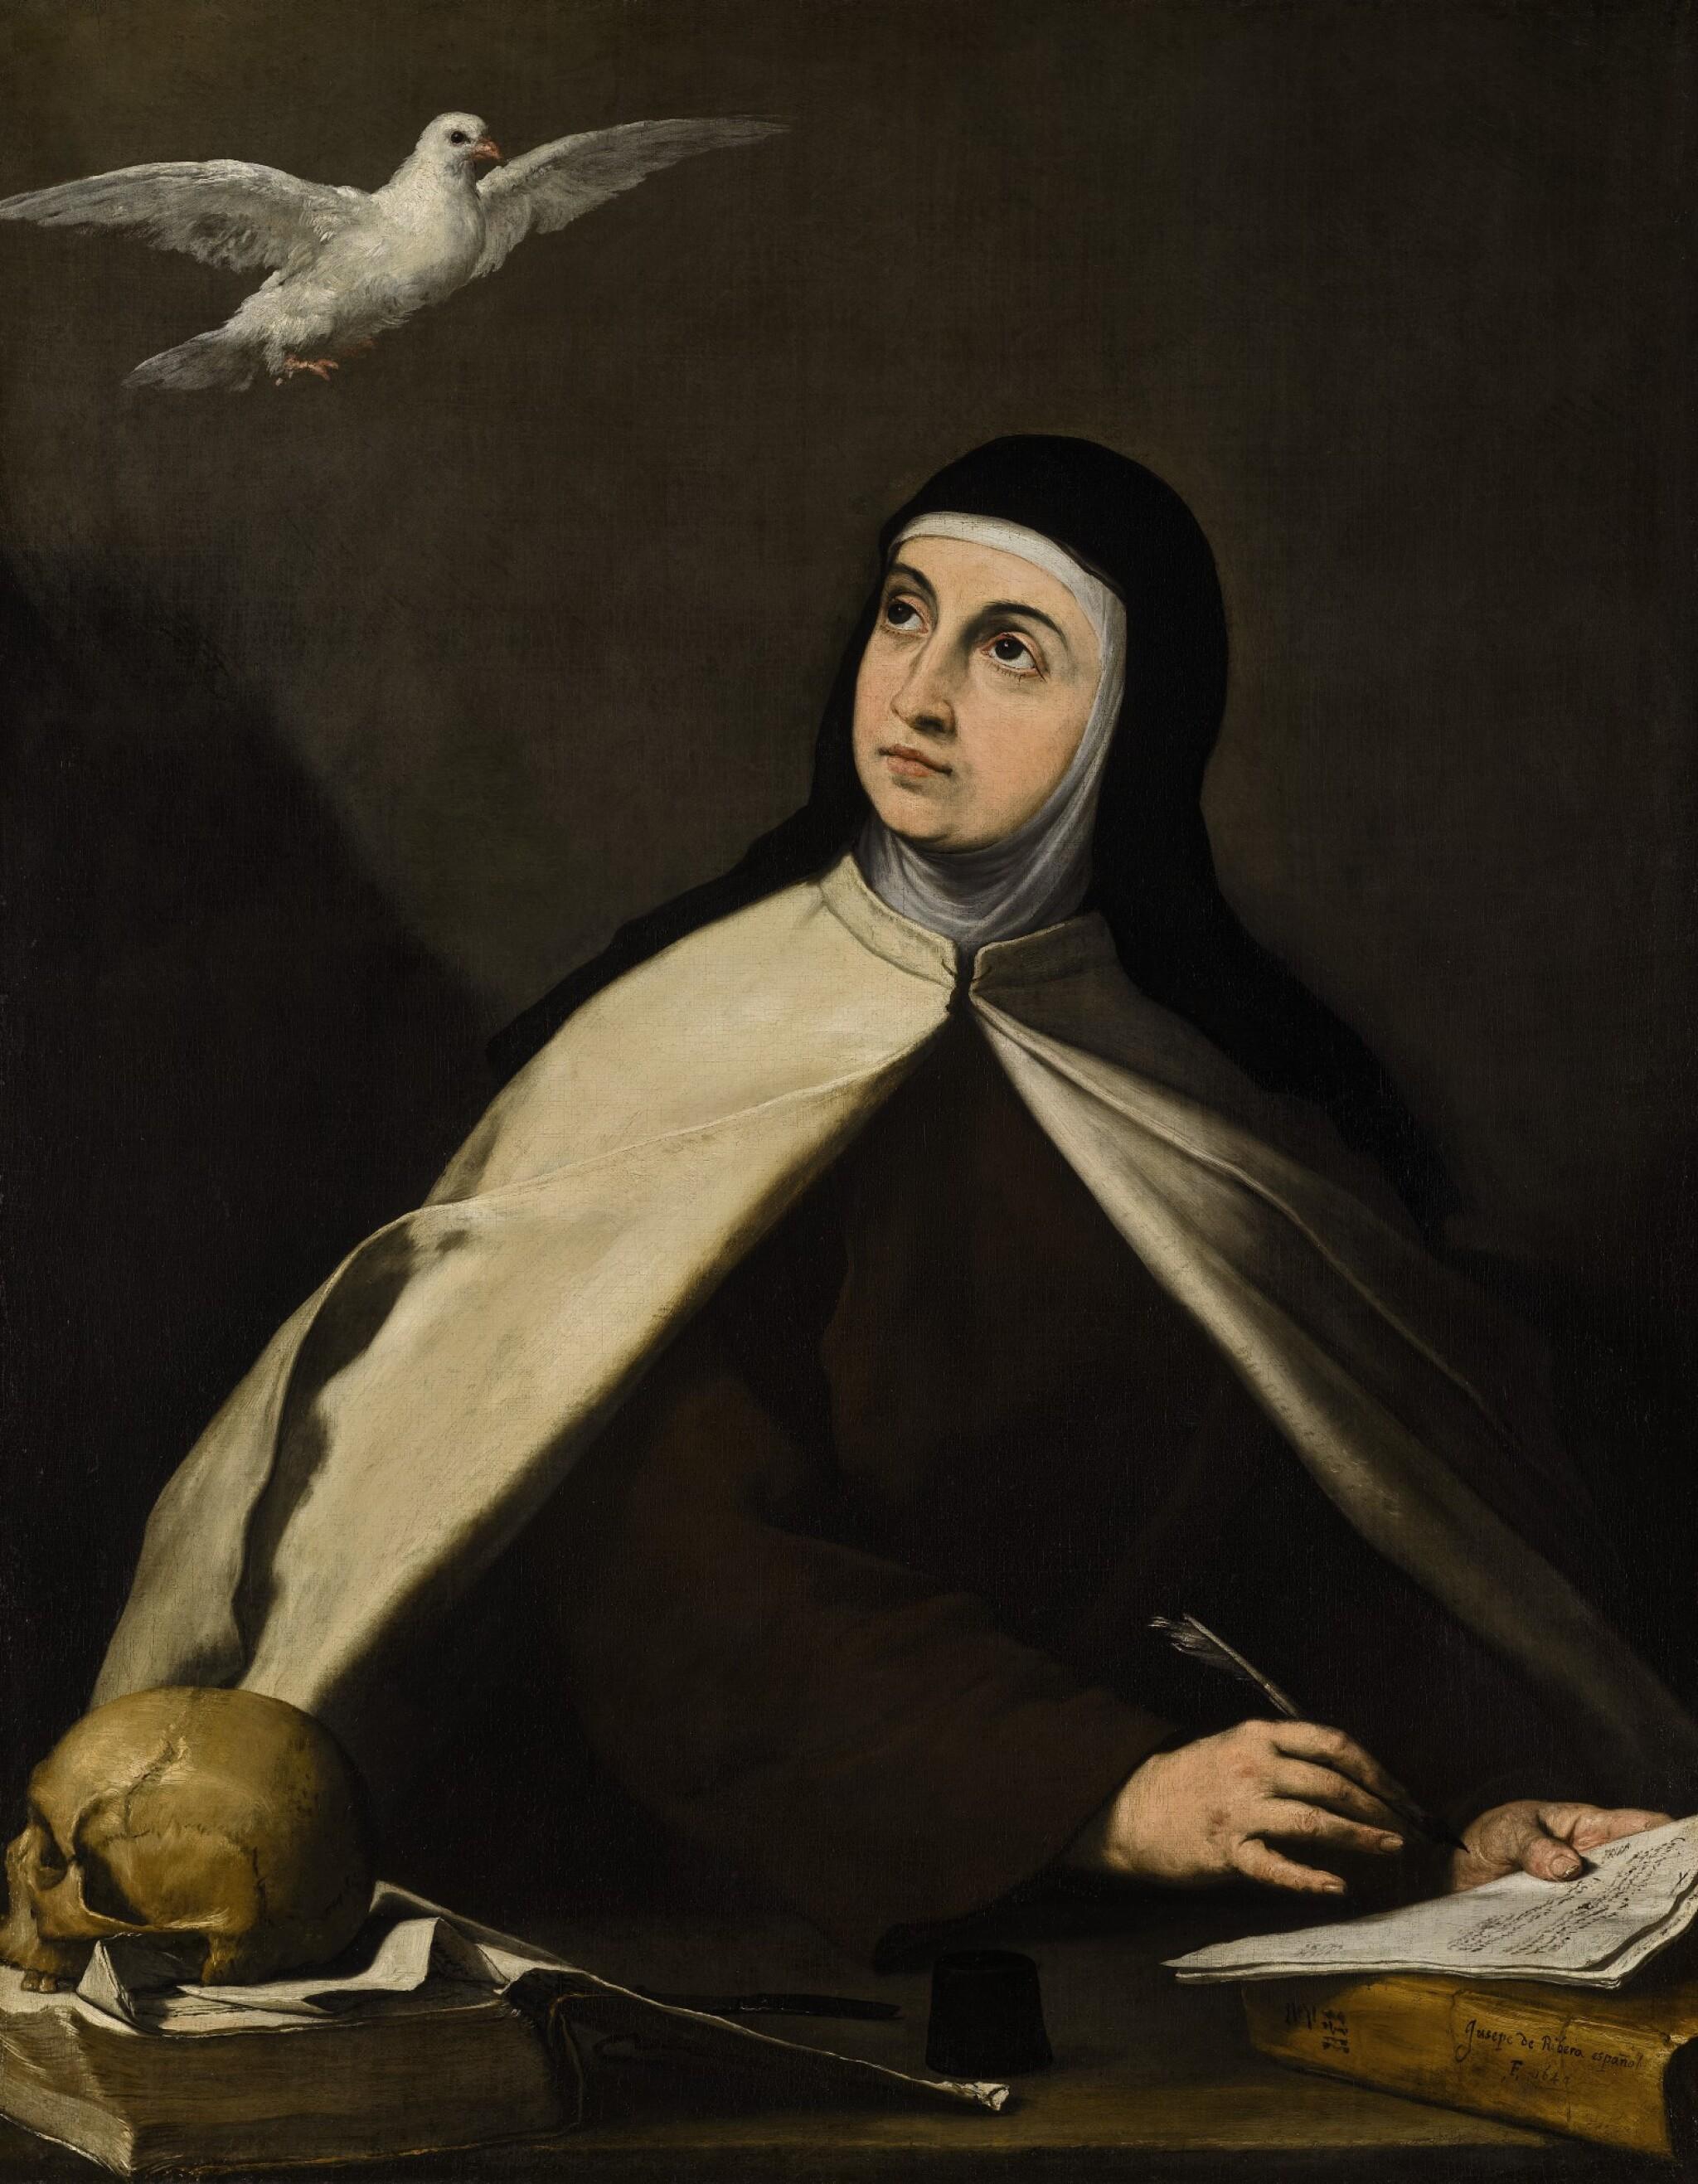 View 1 of Lot 17. Saint Teresa of Avila (1515–1582) |《亞維拉聖德蘭(1515-1582年)》.